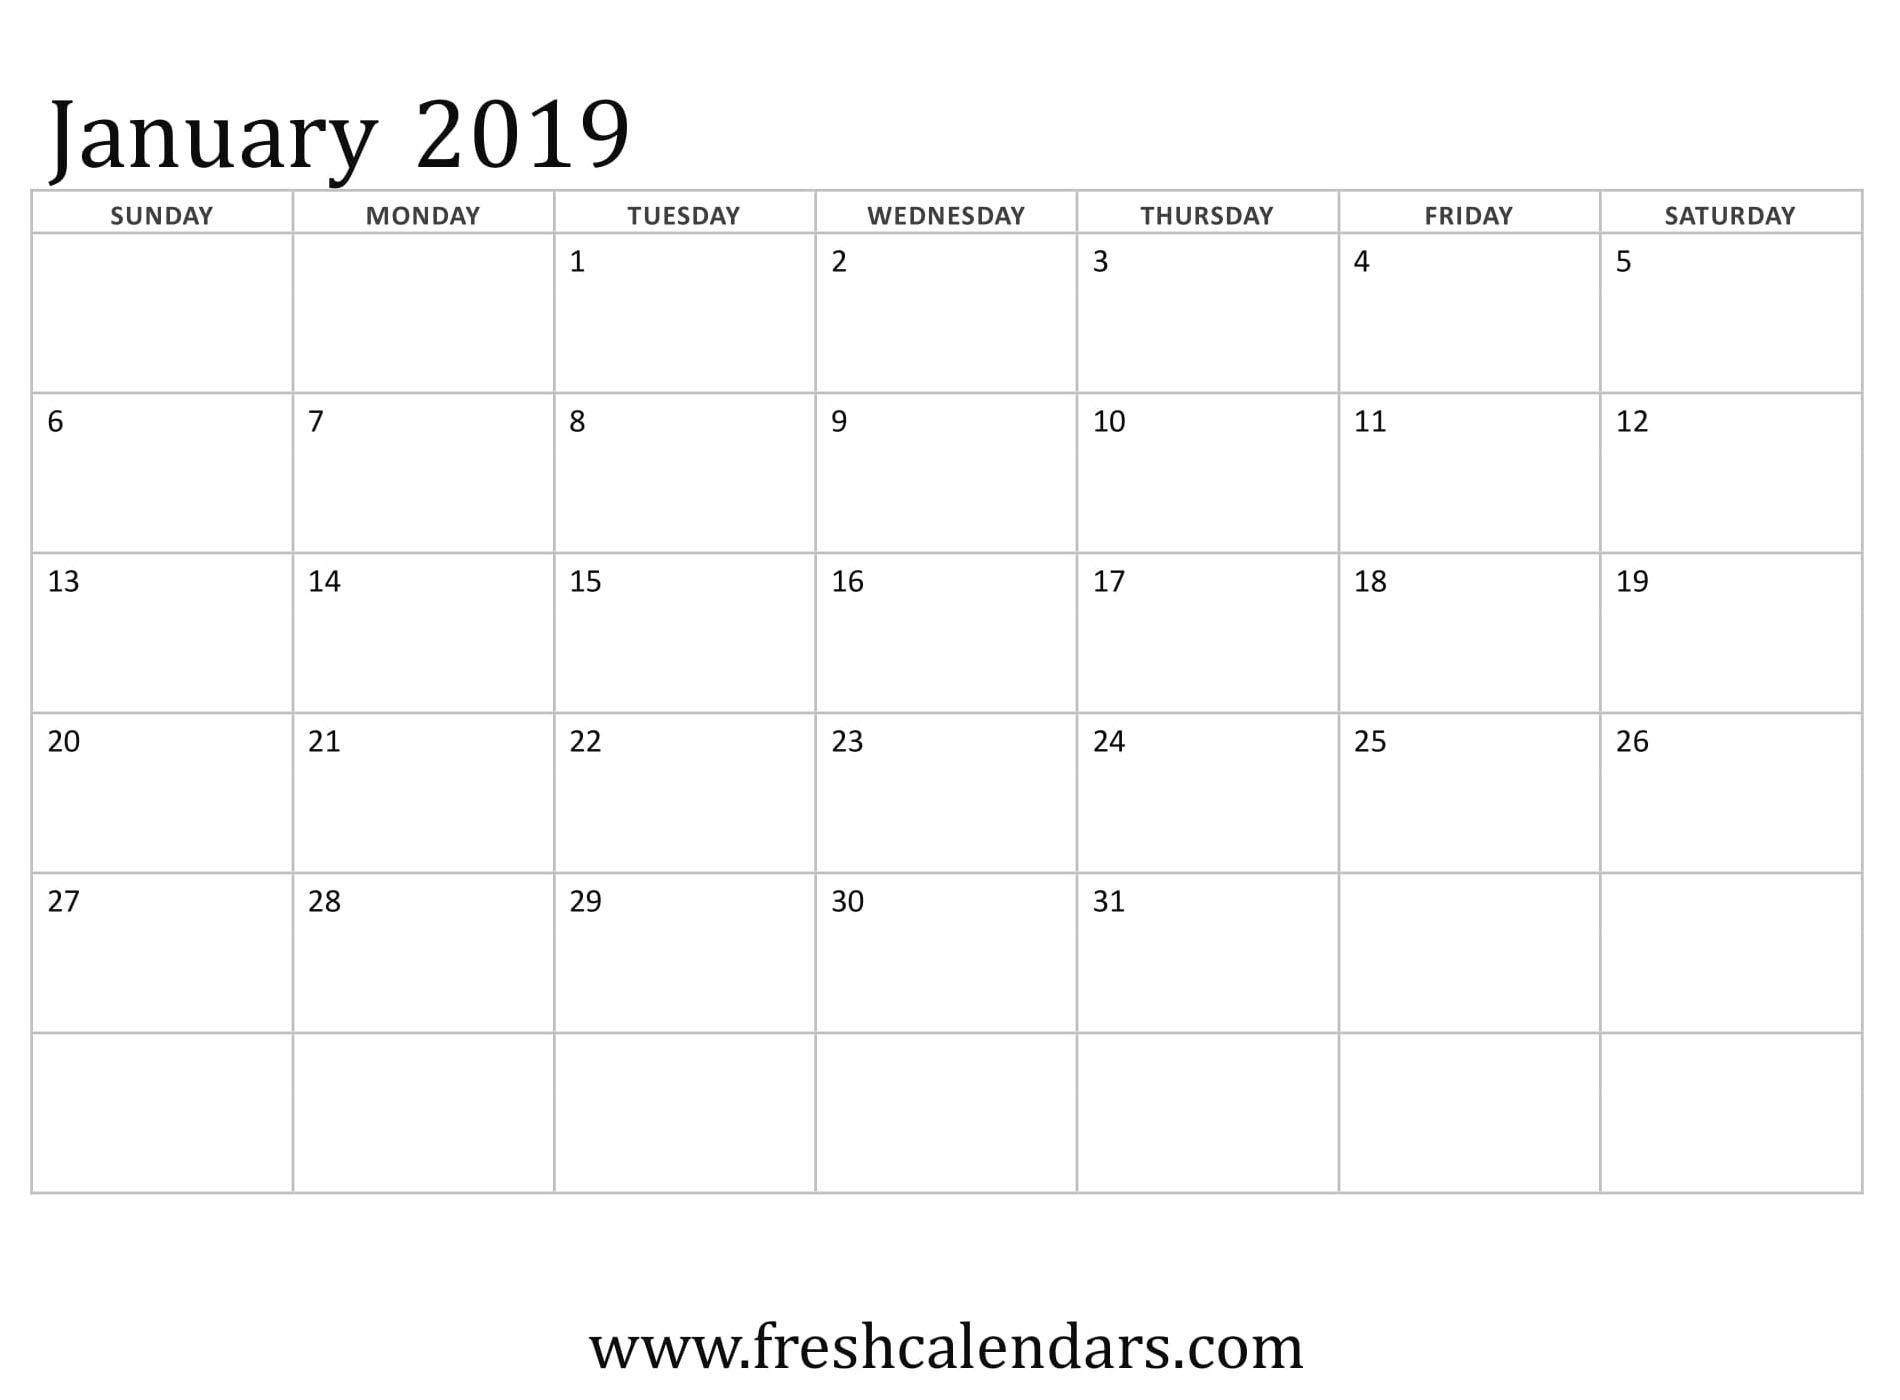 January 2019 Calendar Printable - Fresh Calendars with regard to Free Printable Calendars 2020 Waterproof